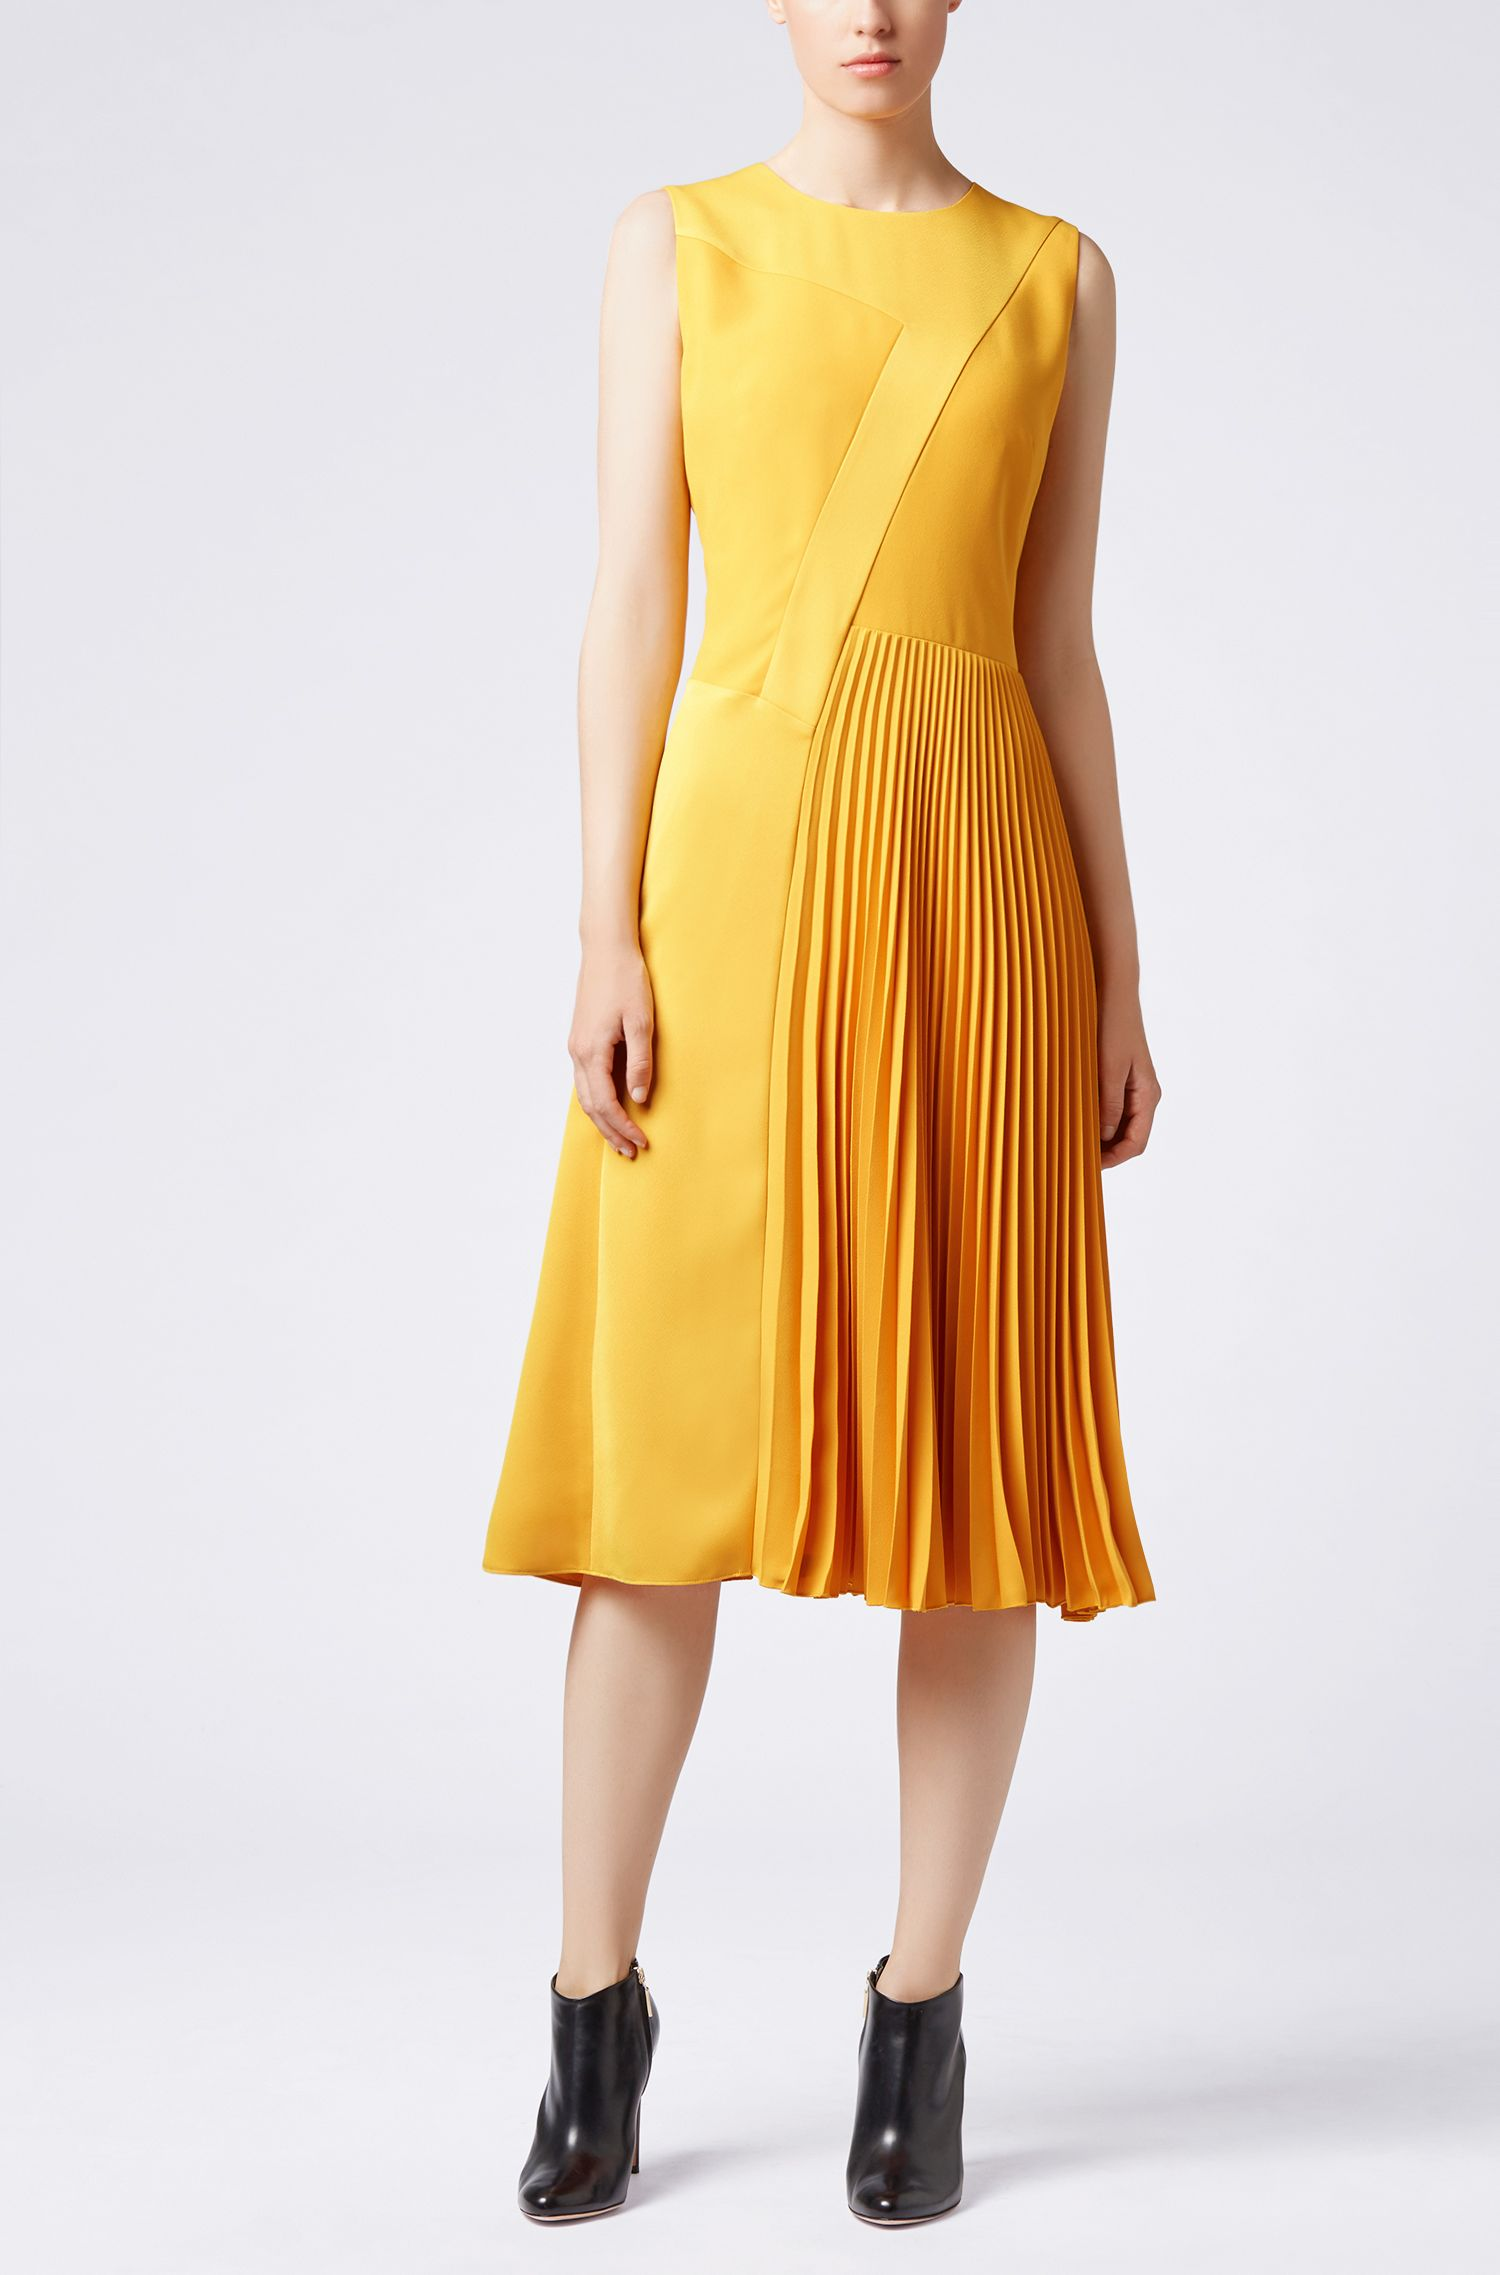 Midi-jurk in patchwork-crêpe met plissédetail in de rok, Geel